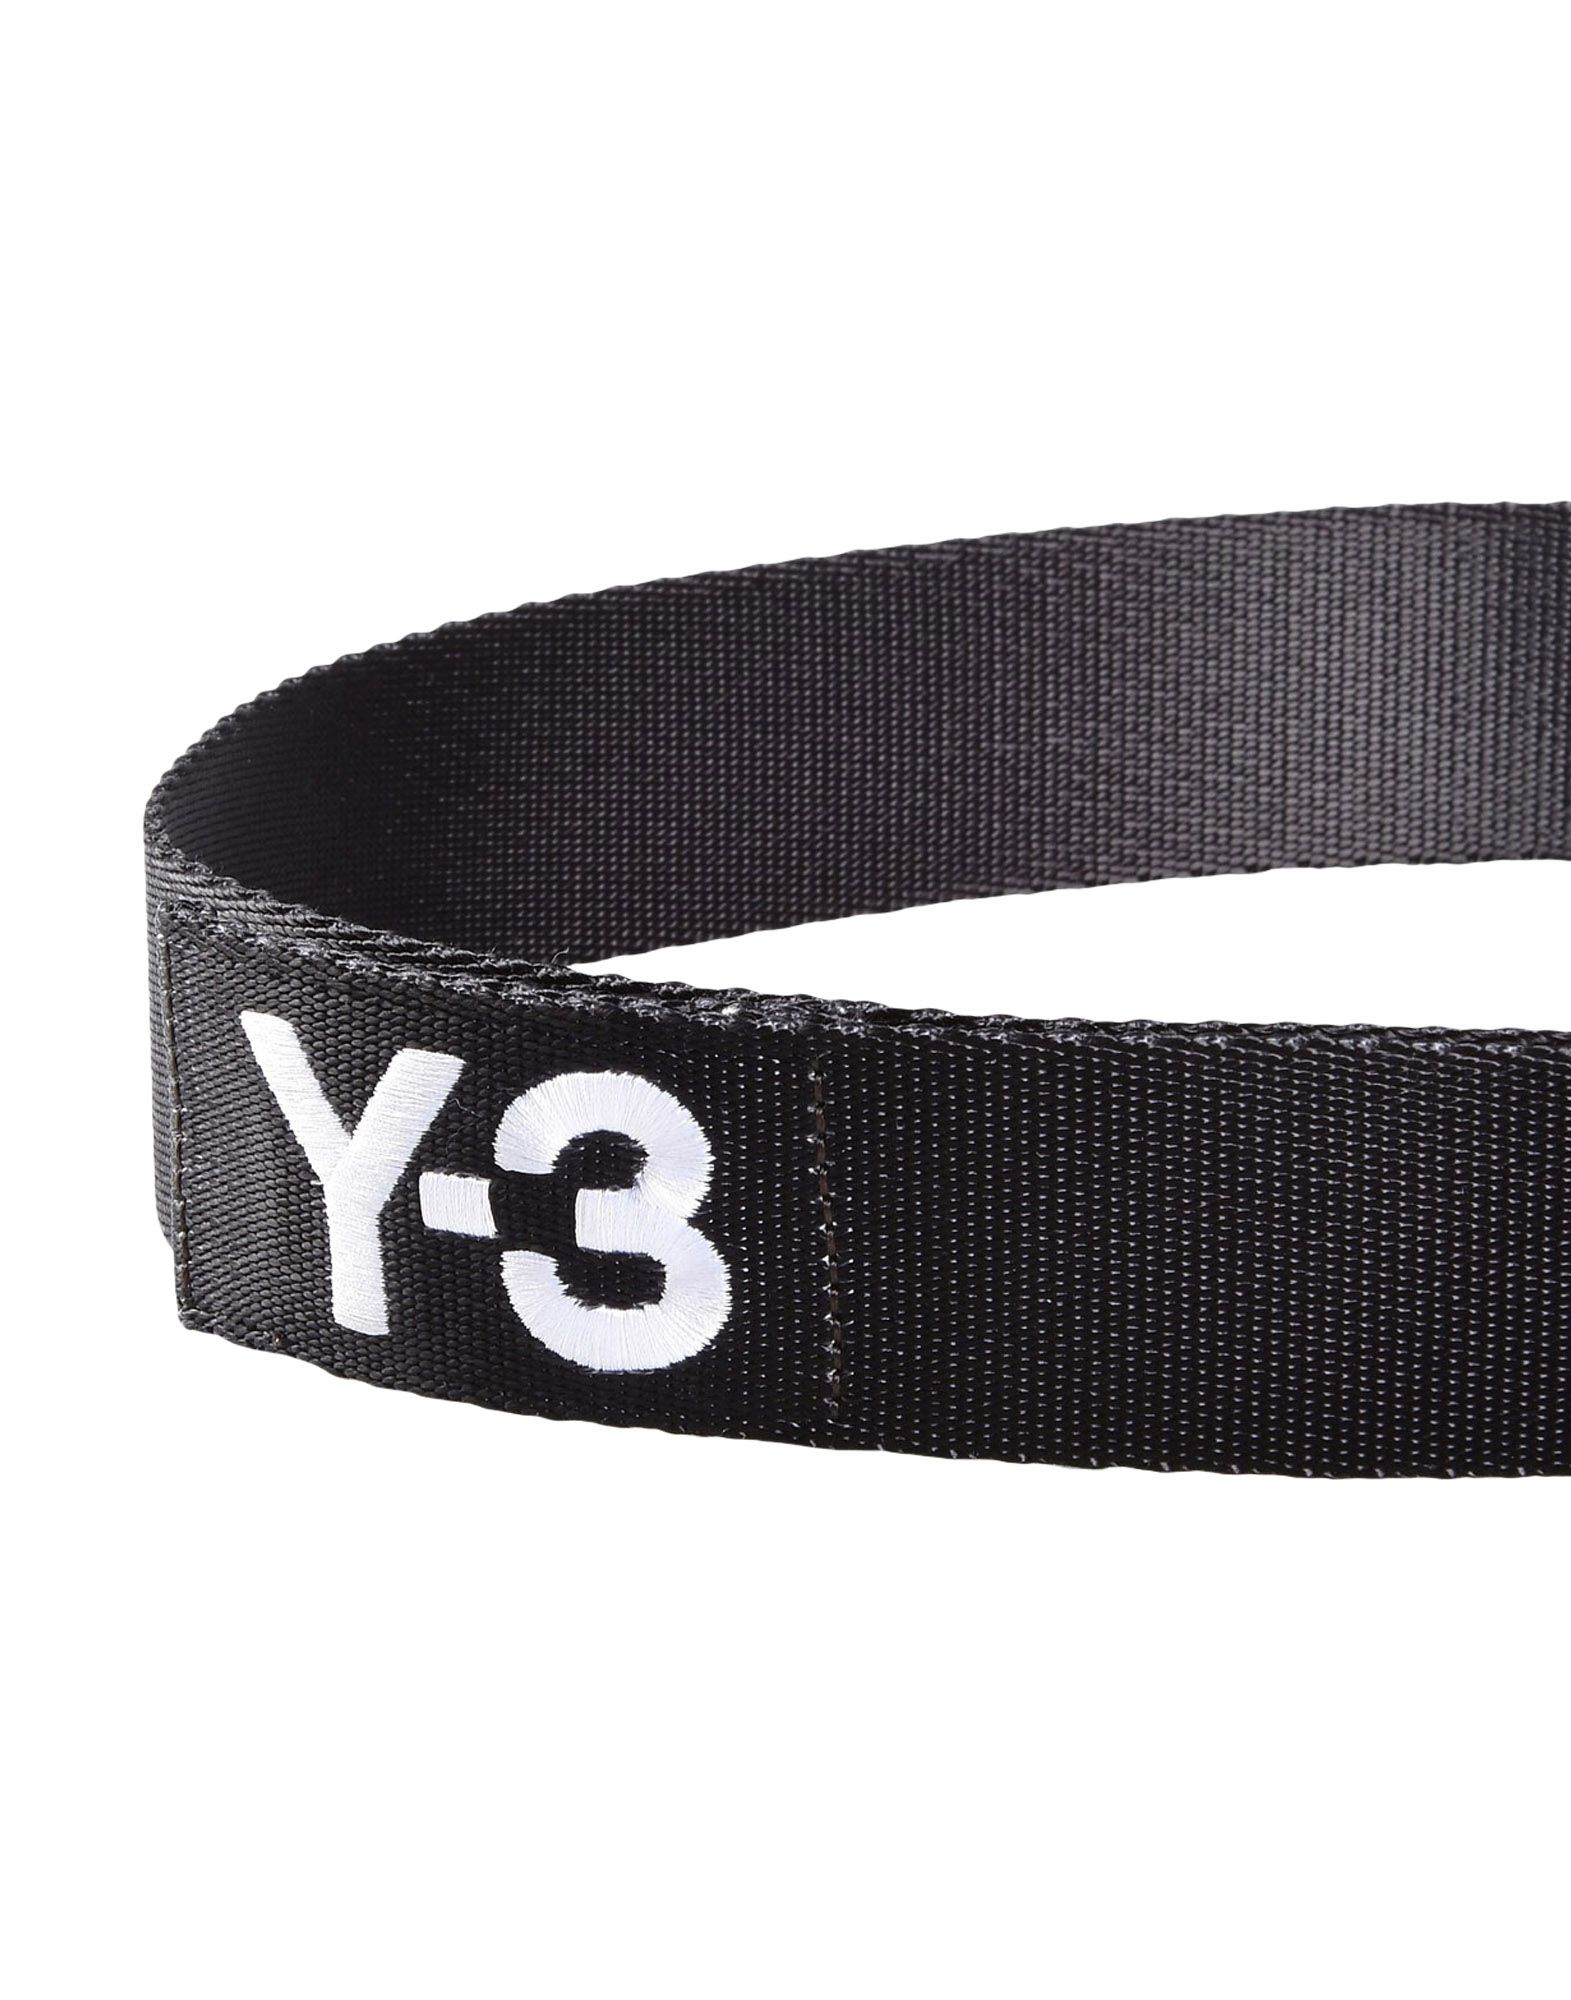 Y-3 3-STRIPES BELT OTHER ACCESSORIES unisex Y-3 adidas